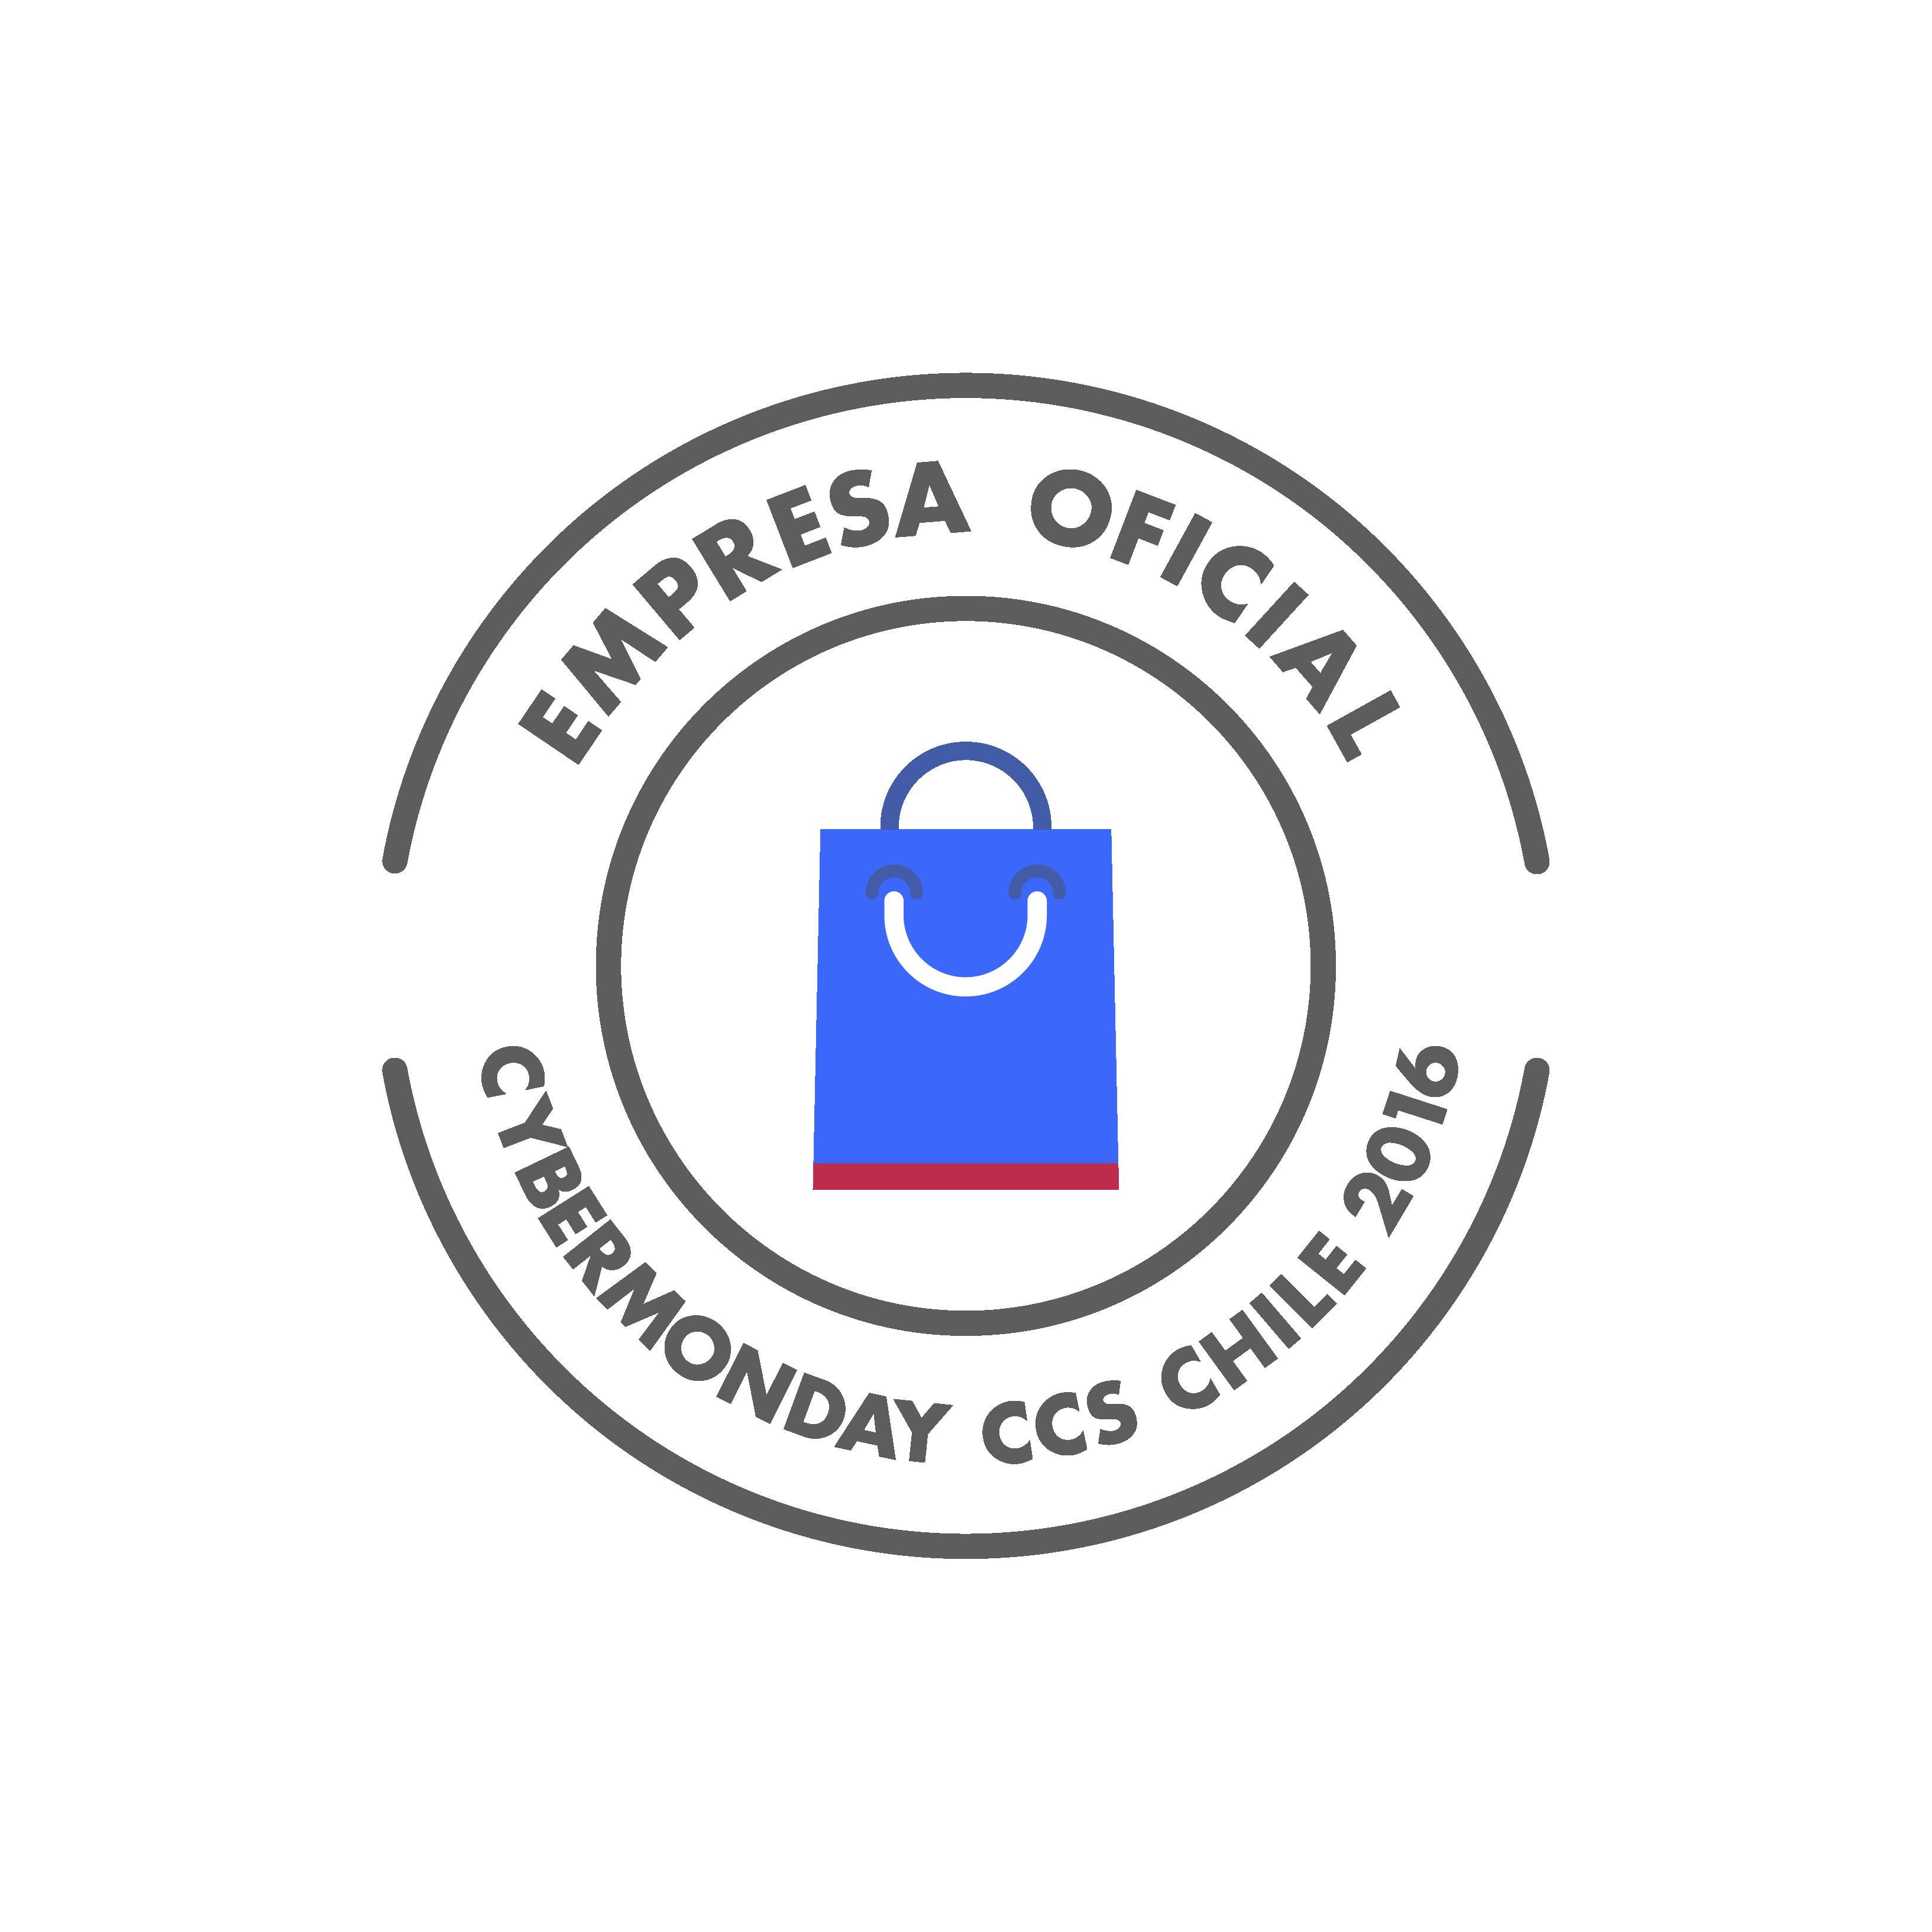 Cybermonday Logo